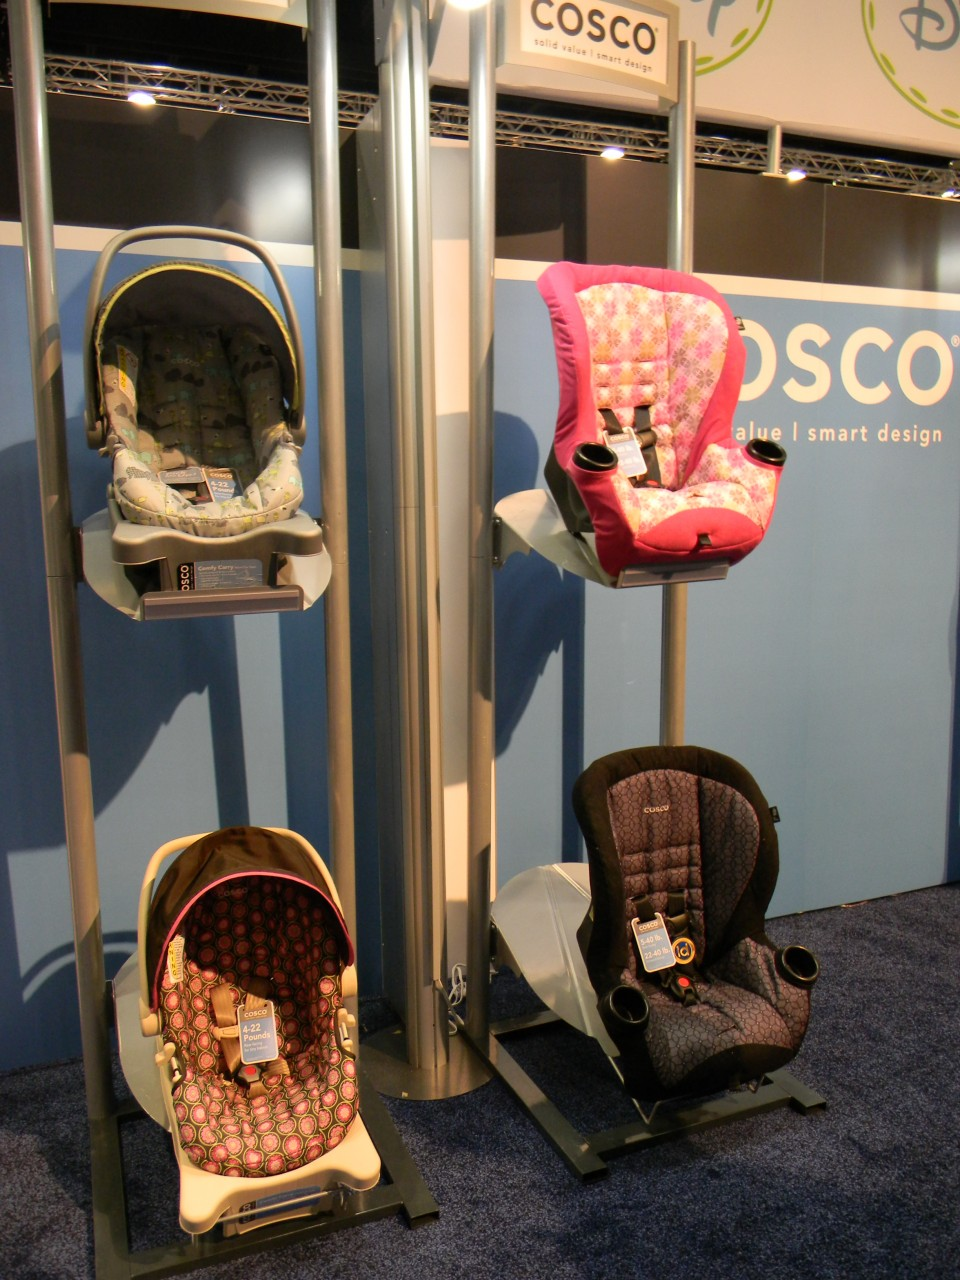 download eddie bauer infant car seat manual prizeggett. Black Bedroom Furniture Sets. Home Design Ideas